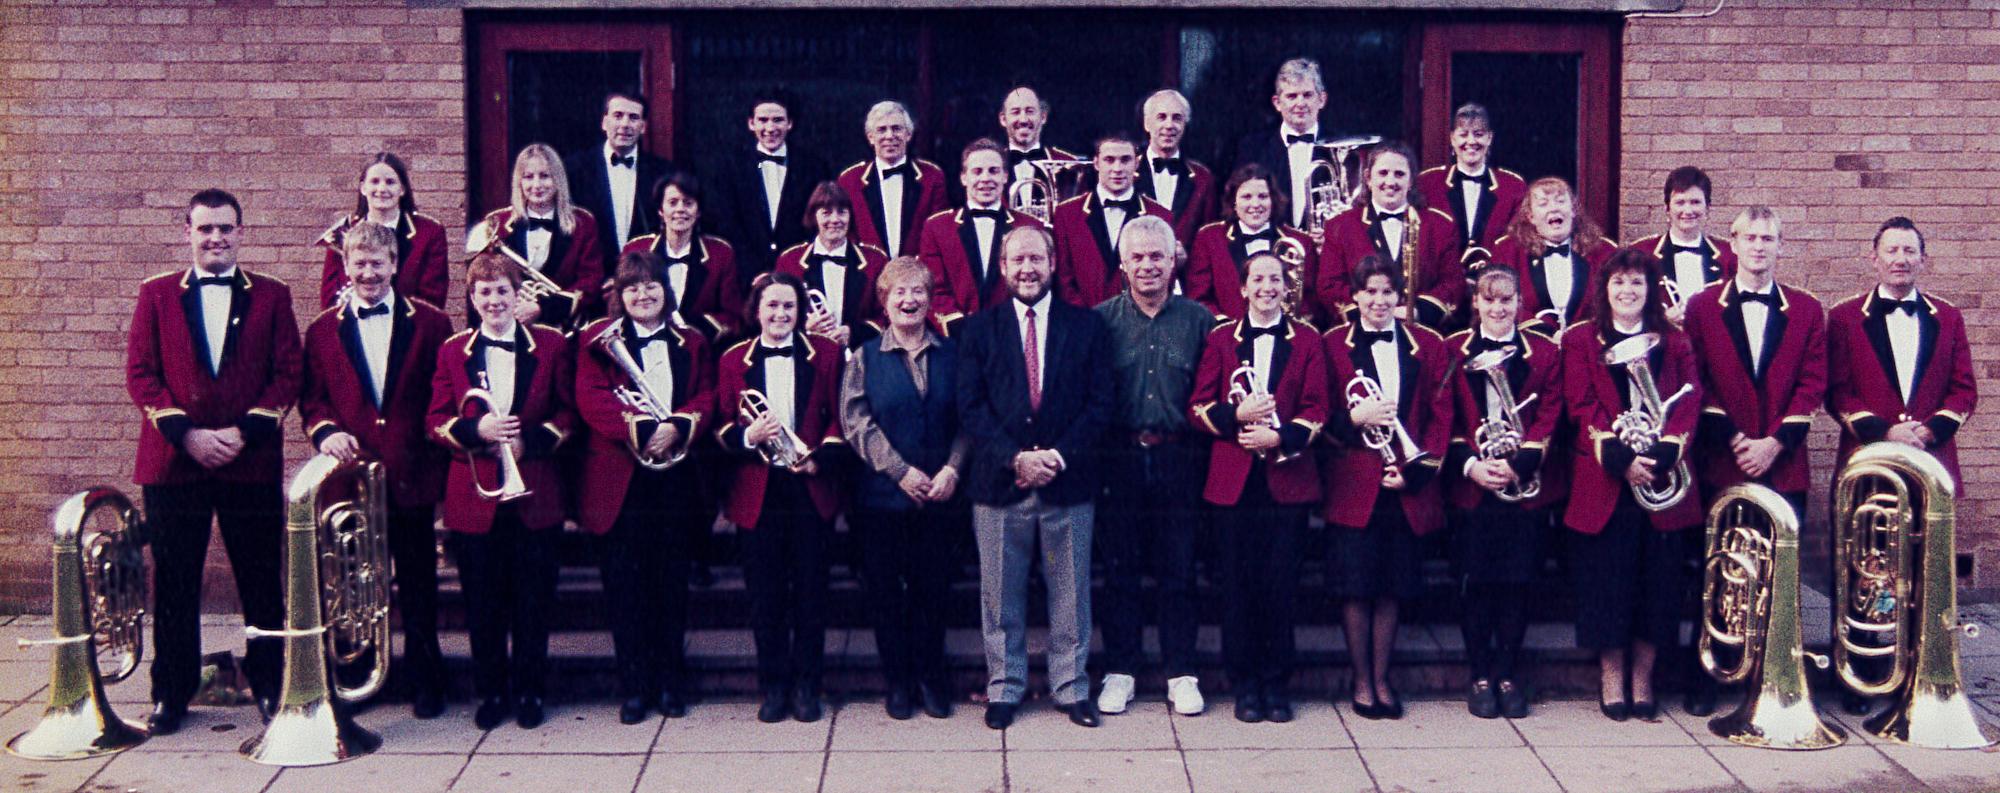 Forest of Dean Brass 1994